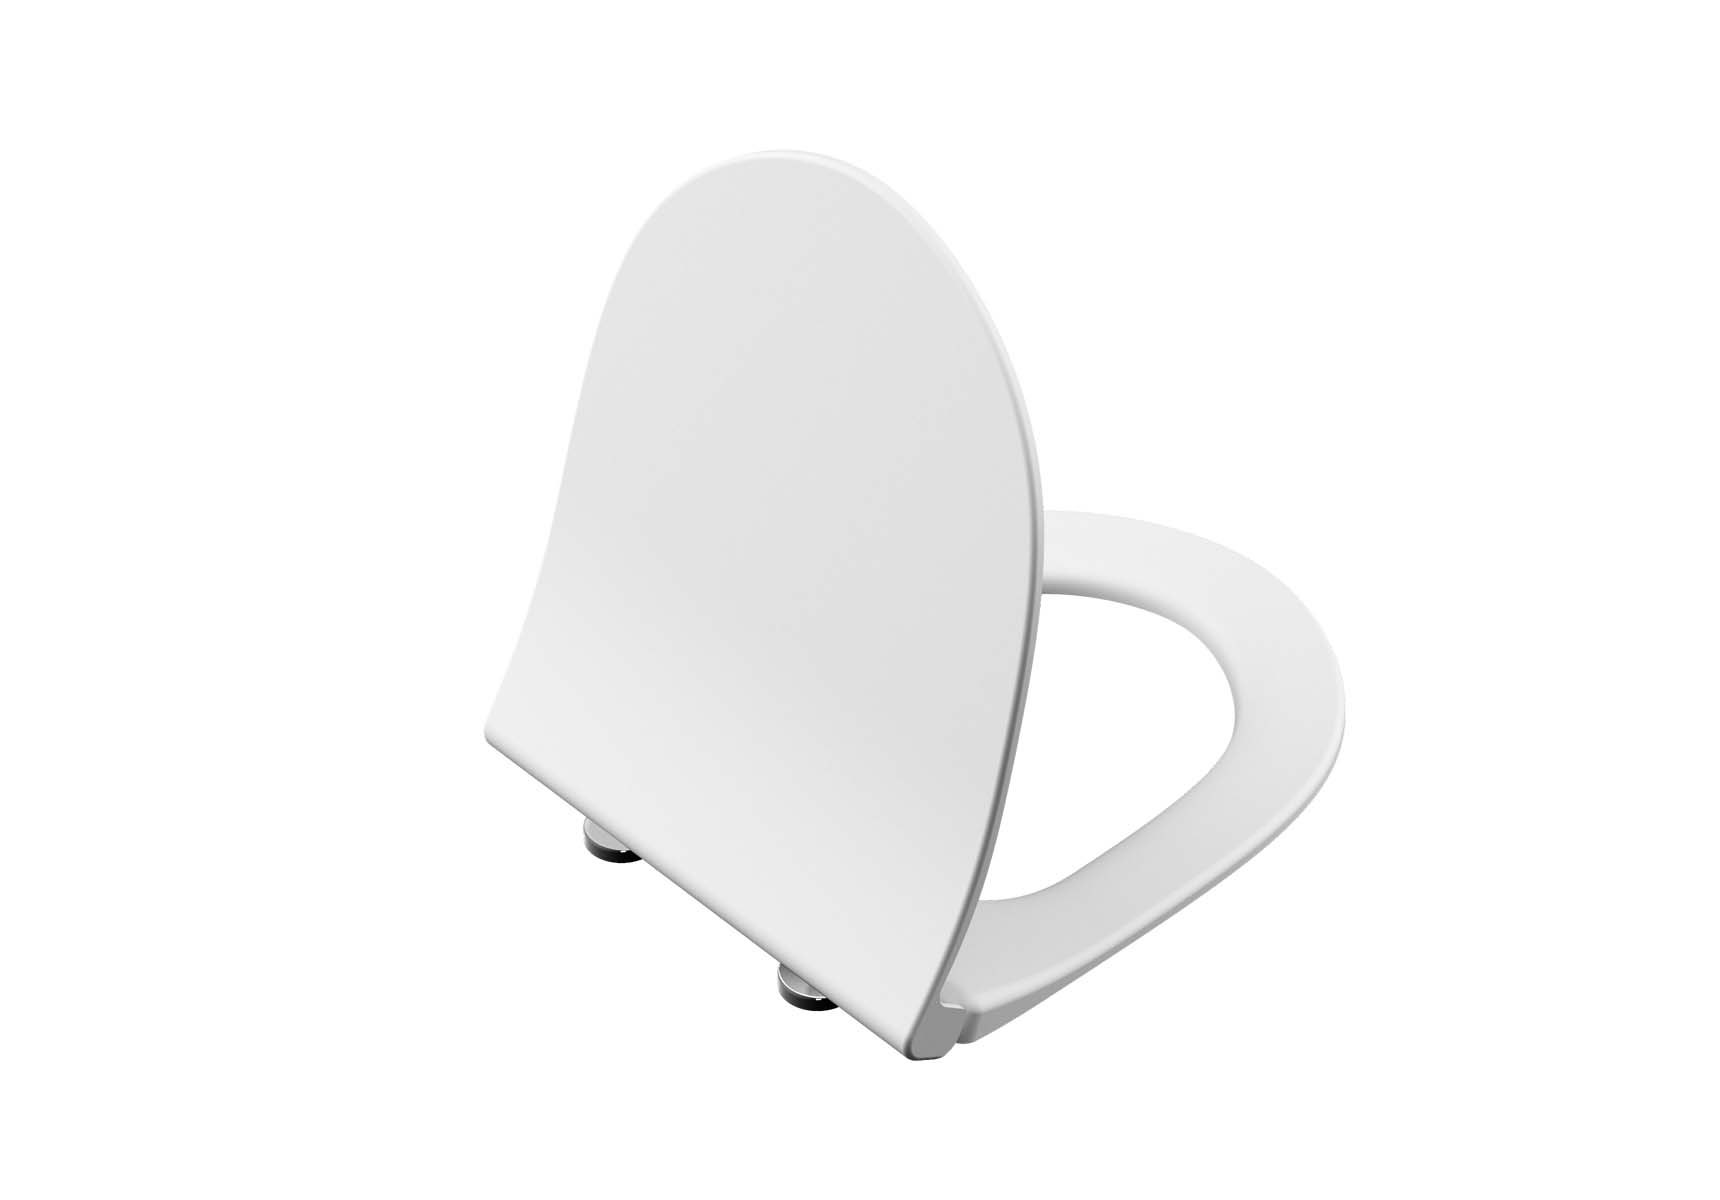 Sento/Bella Slım WC Seat, Soft Closing